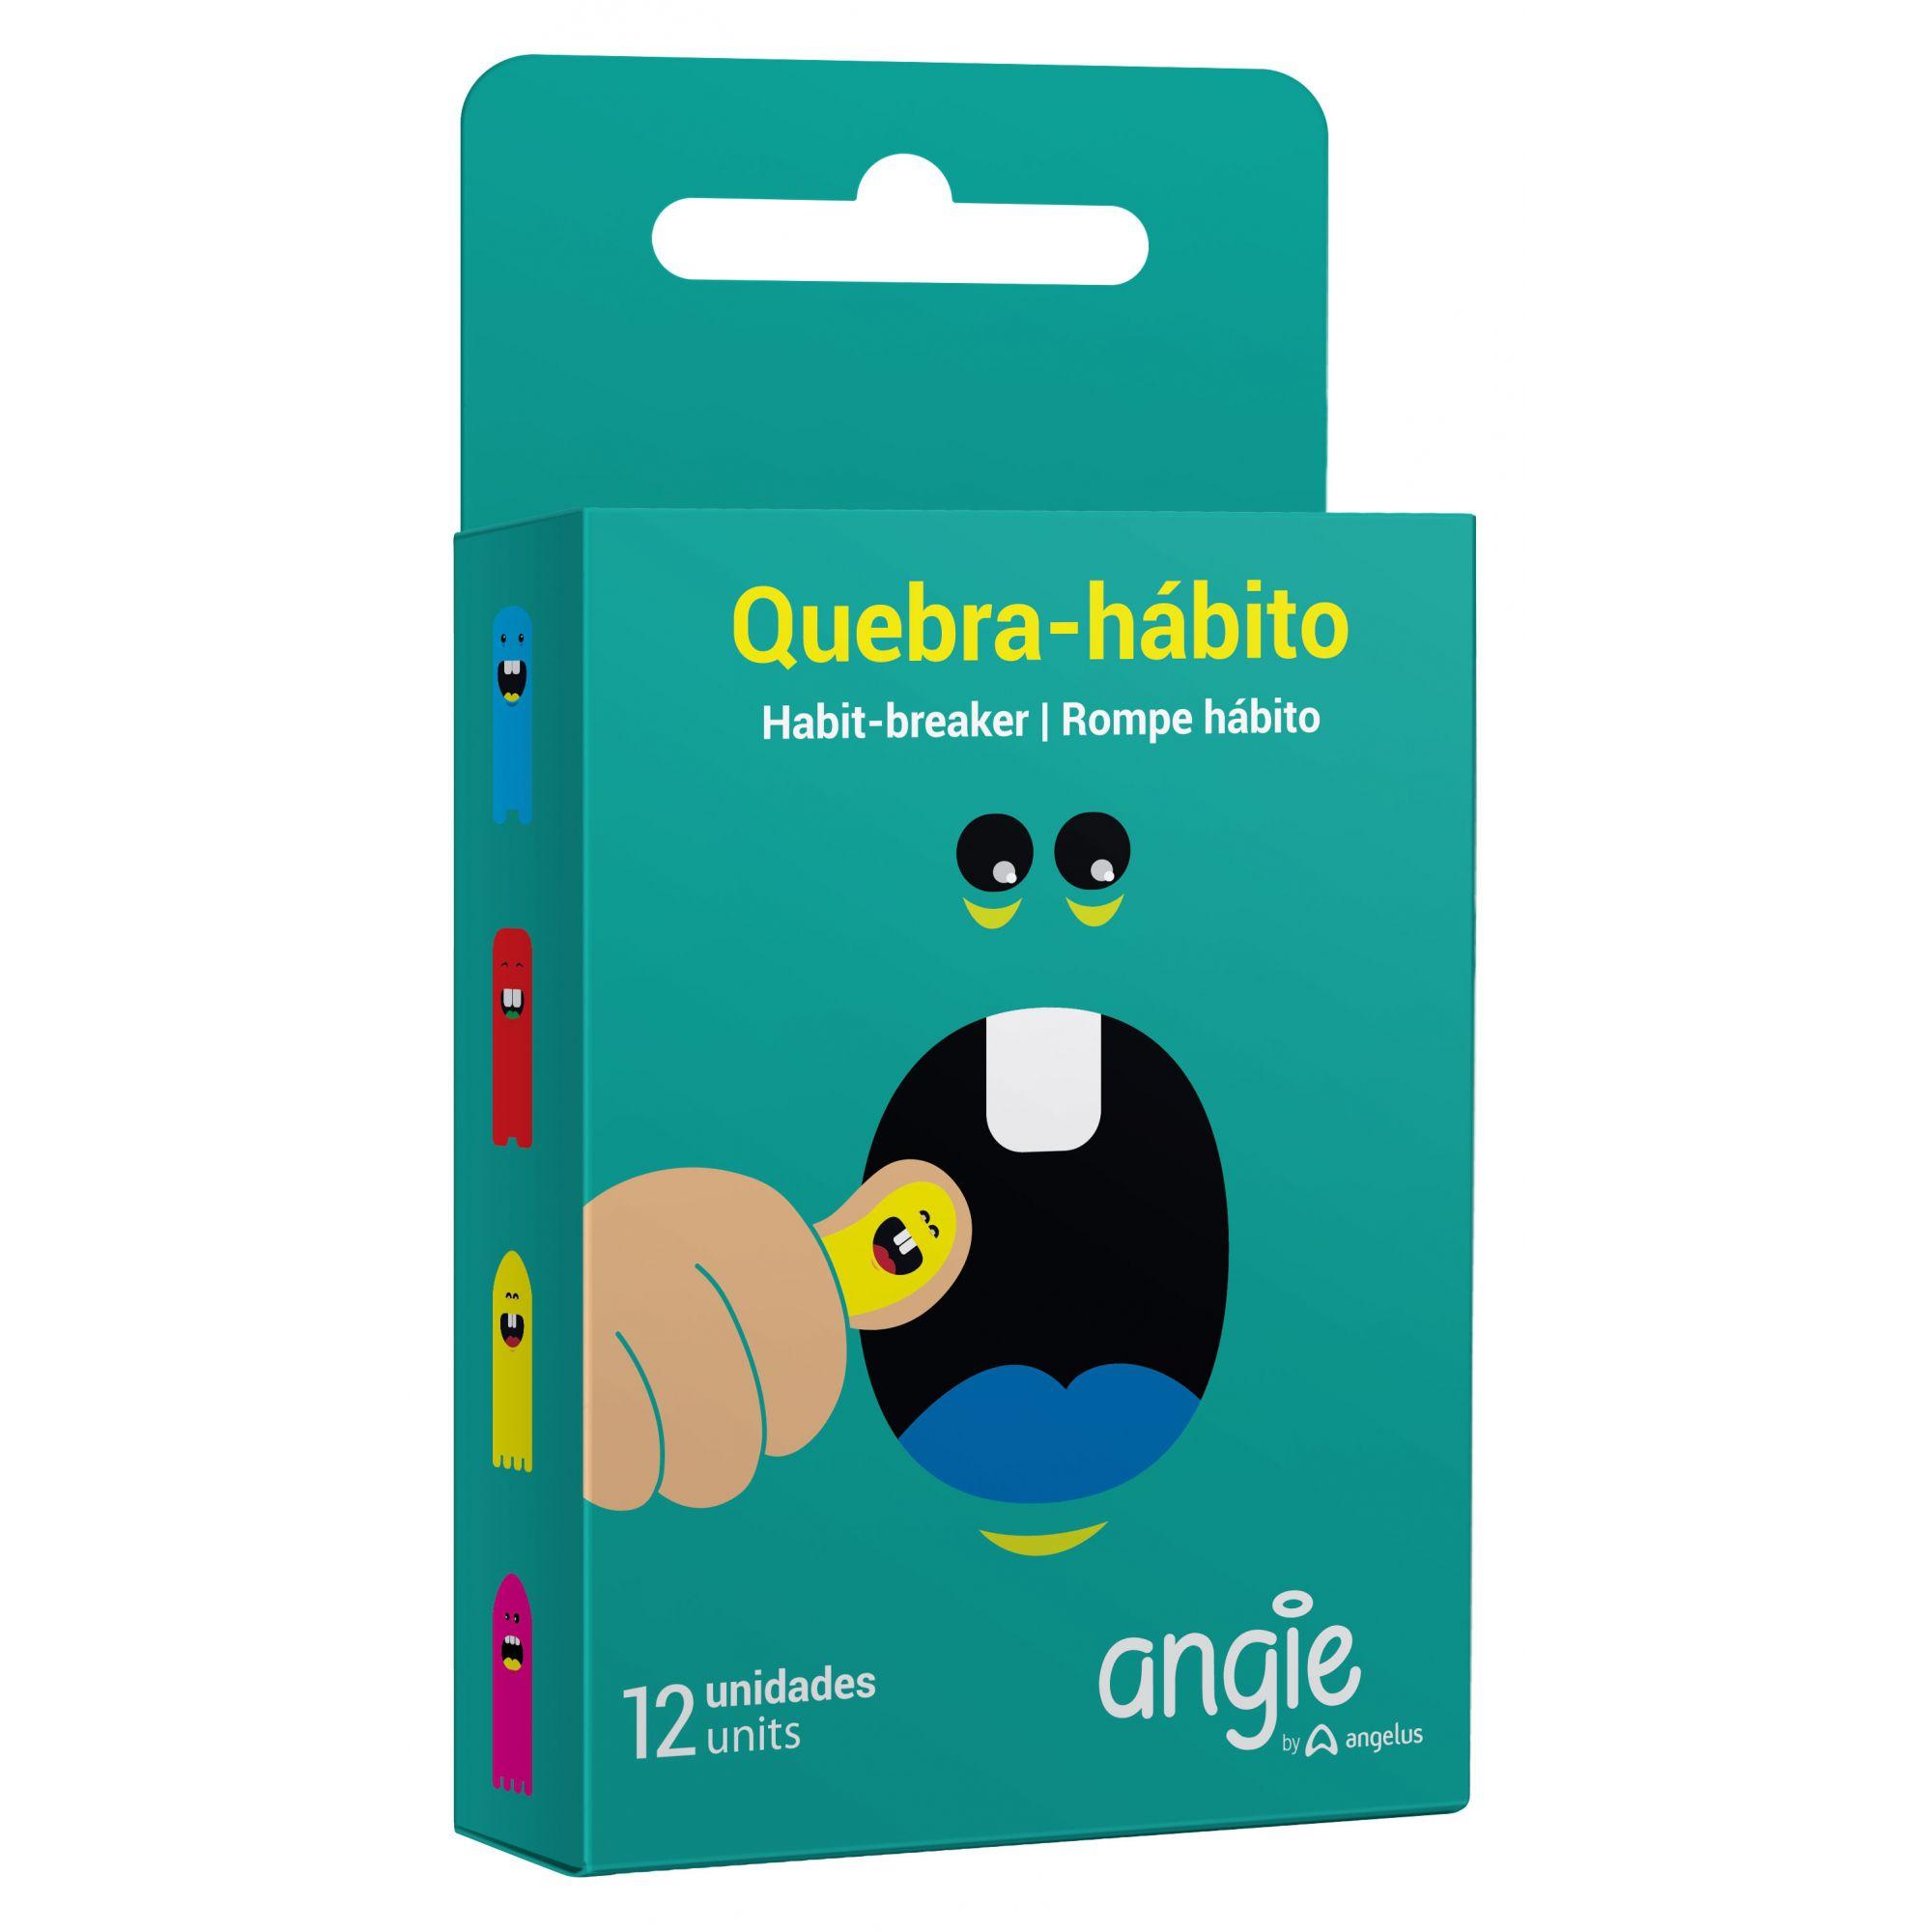 Quebra Hábito - Angie Ref 315